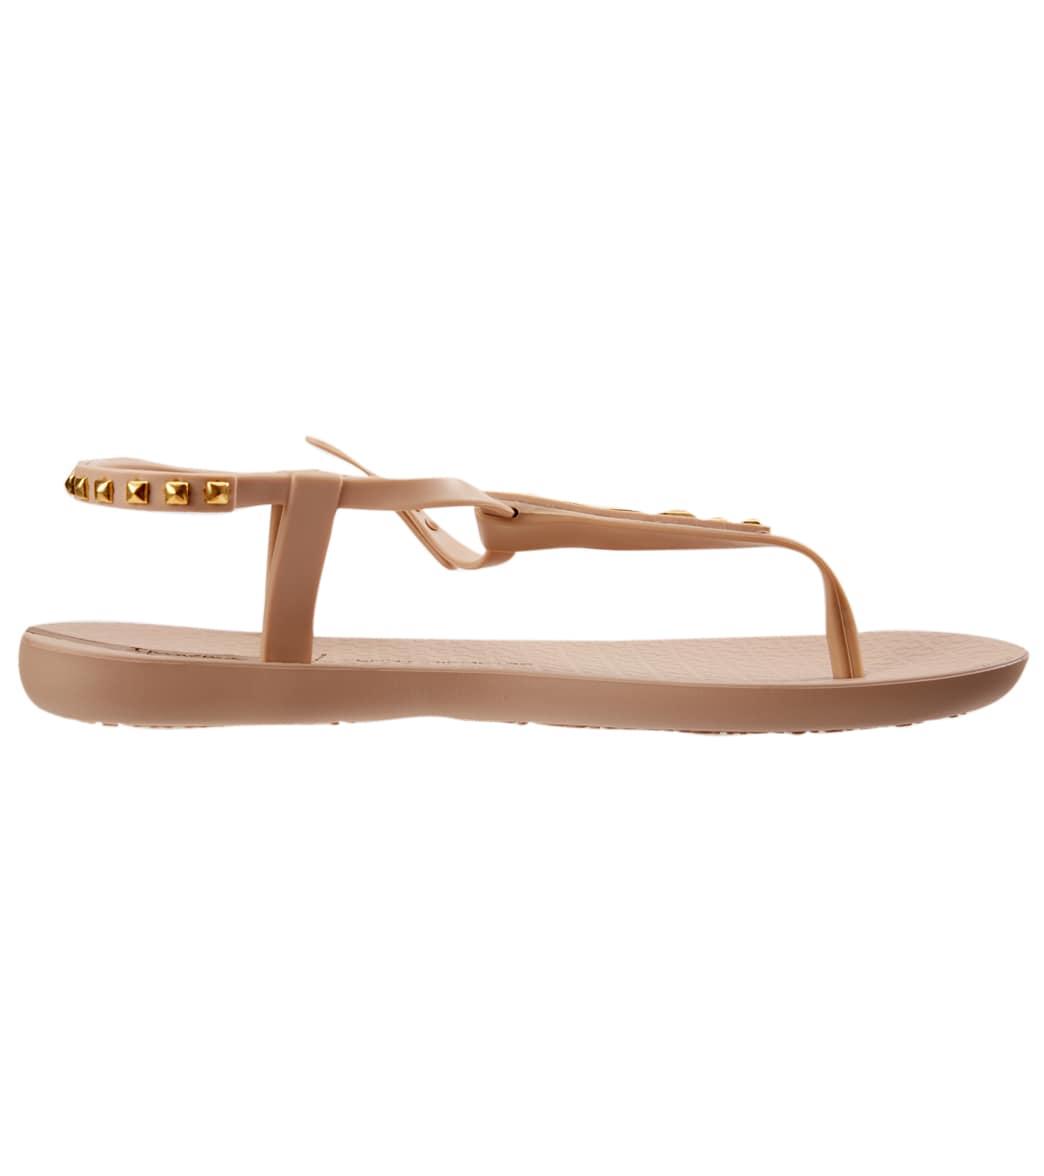 8afe163e7463 Ipanema Women s Premium Lenny Rocker Sandal at SwimOutlet.com - Free ...